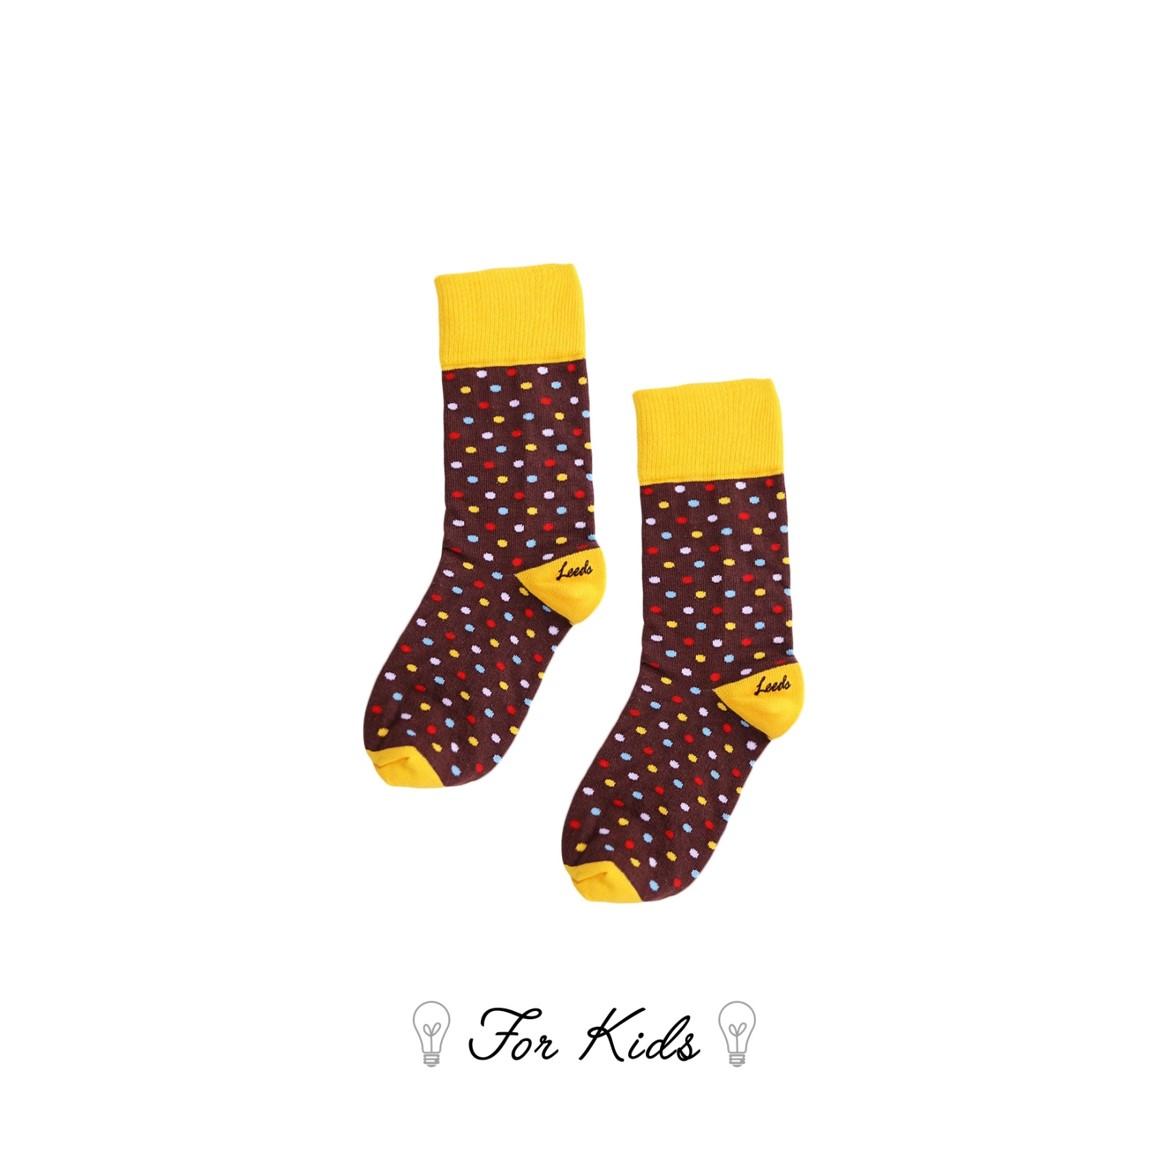 Leeds weather【英國設計】天然純棉孩童襪子★點點造型水果襪子【Cotton Socks Recommendations】- Swiss Chocolate ( International Dots Day系列共4款) 皇室孩童御用推薦童襪、可愛時尚穿搭、好看舒適又透氣